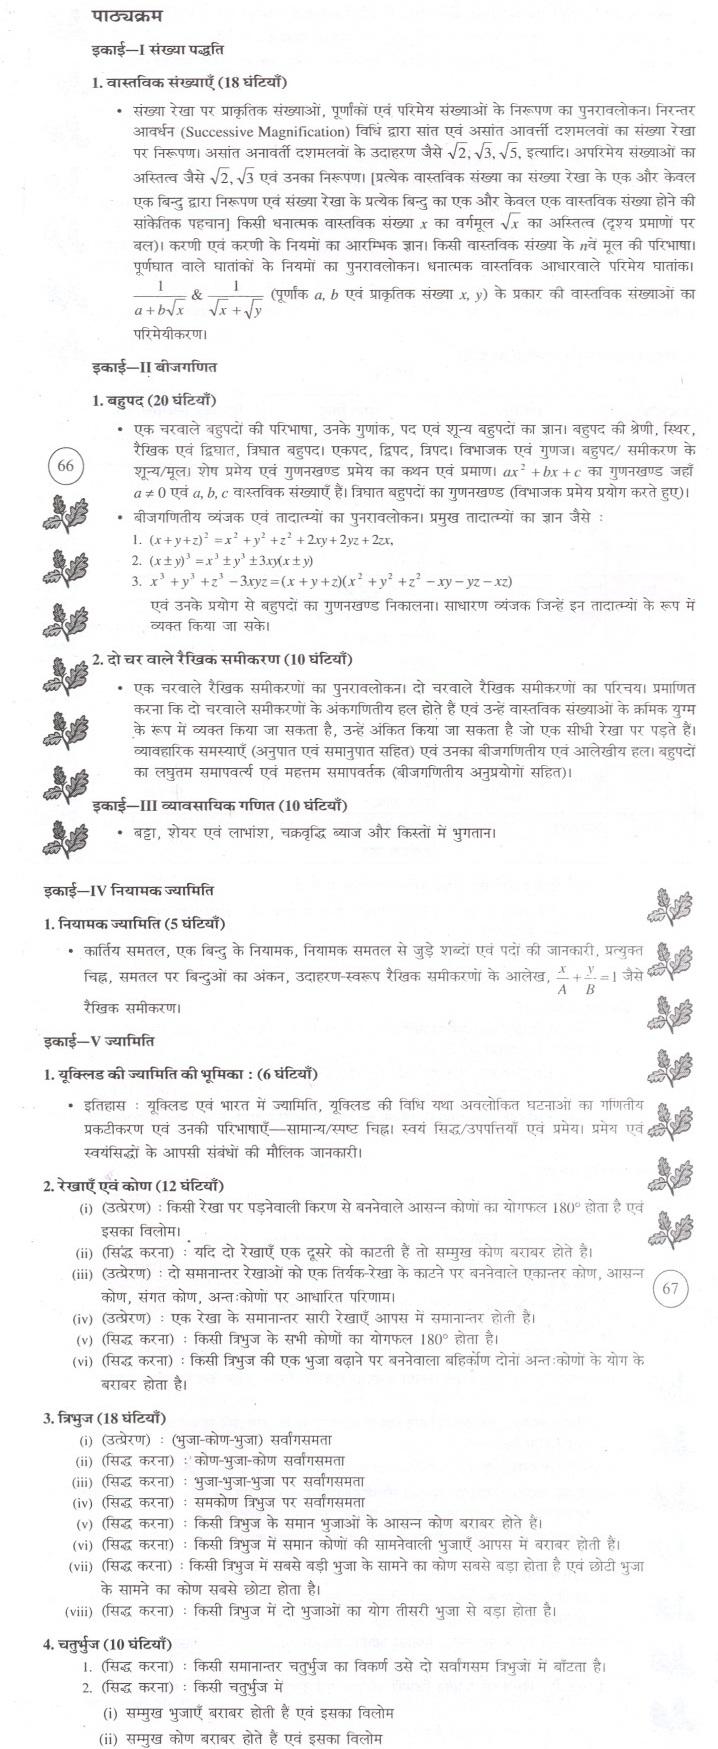 BSEB Syllabus For Class 9th 10th Maths 2018-19 Bihar Board Syllabus Mathematics PDF Download